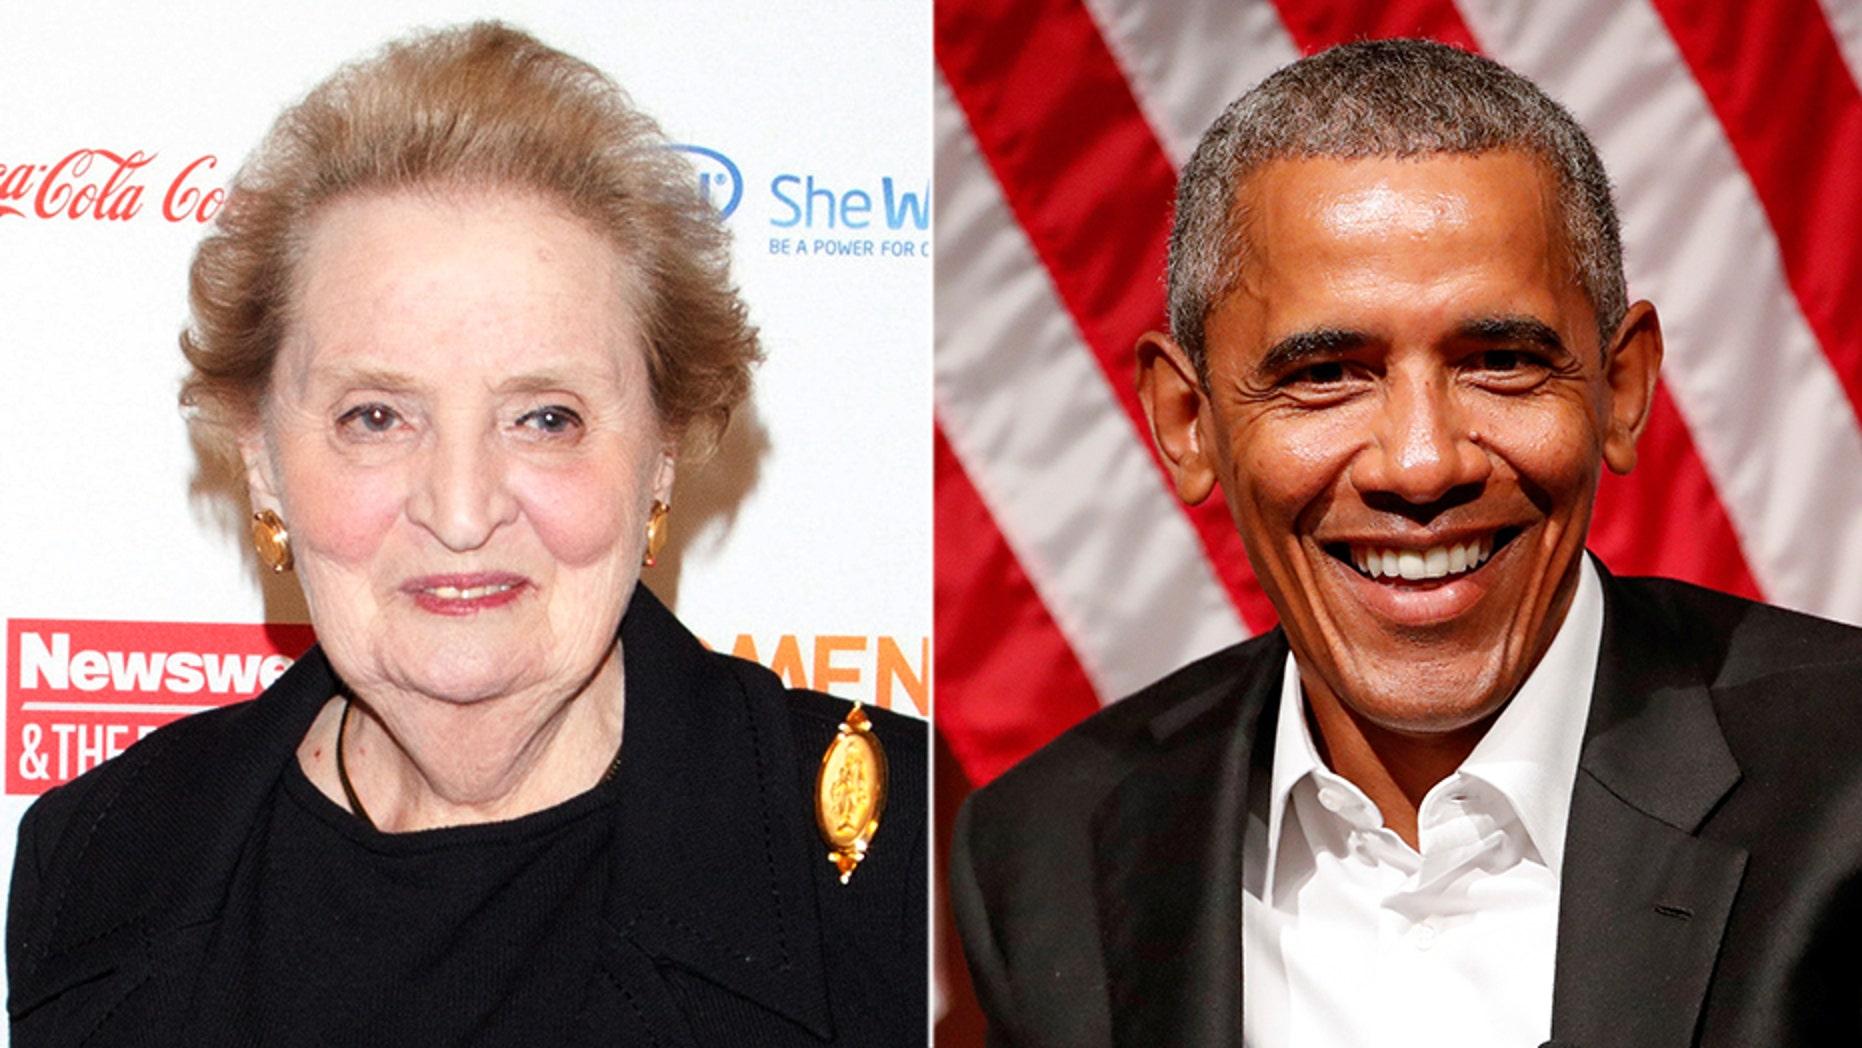 Former Secretary of State Madeleine Albright criticized Barack Obama for his Syria policy.